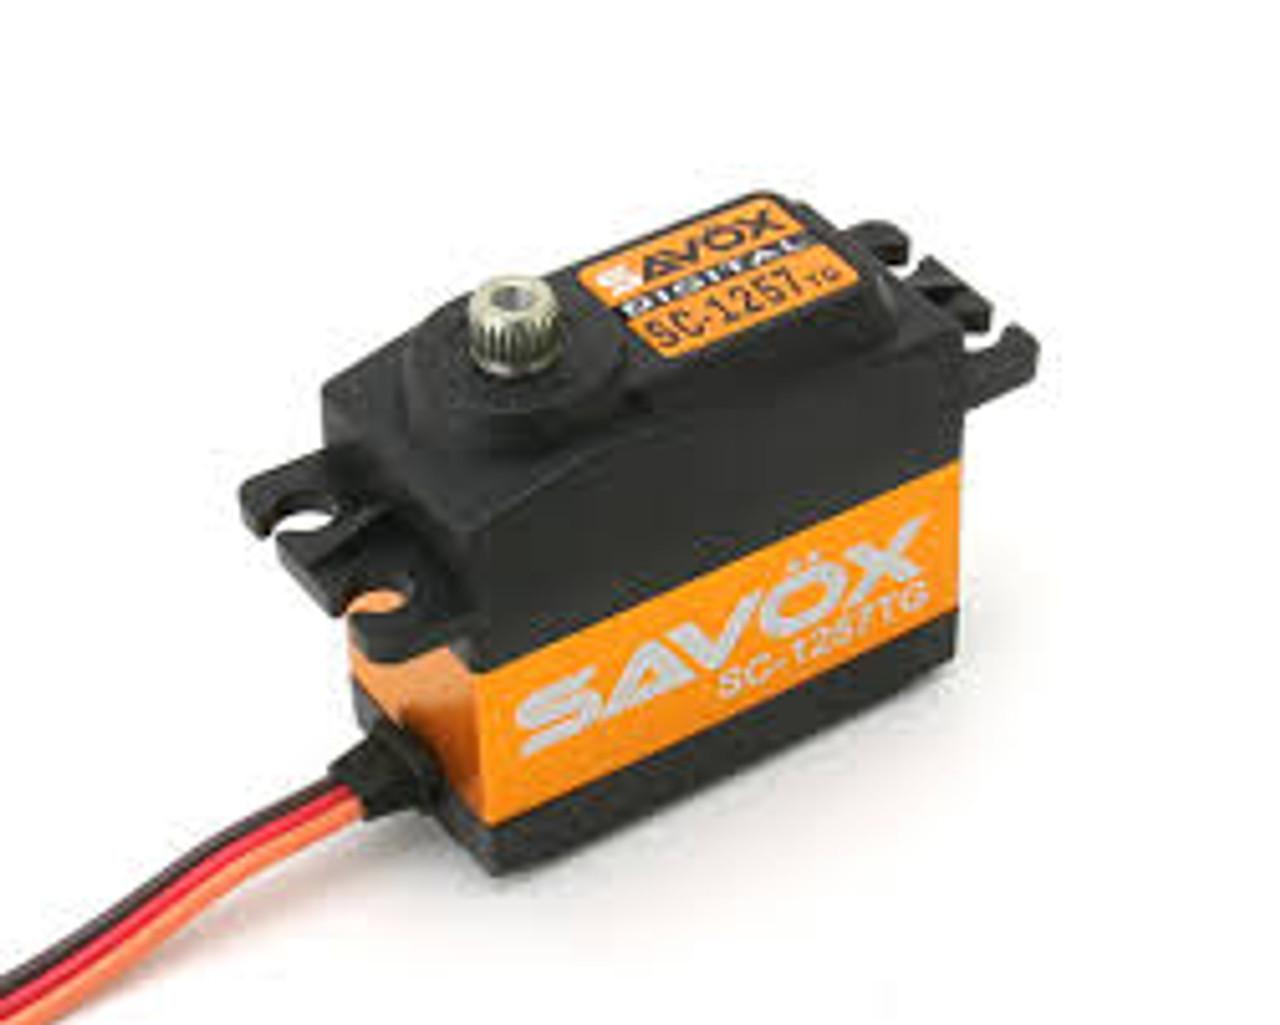 Savox High Speed Titanium Servo 10kg-cm